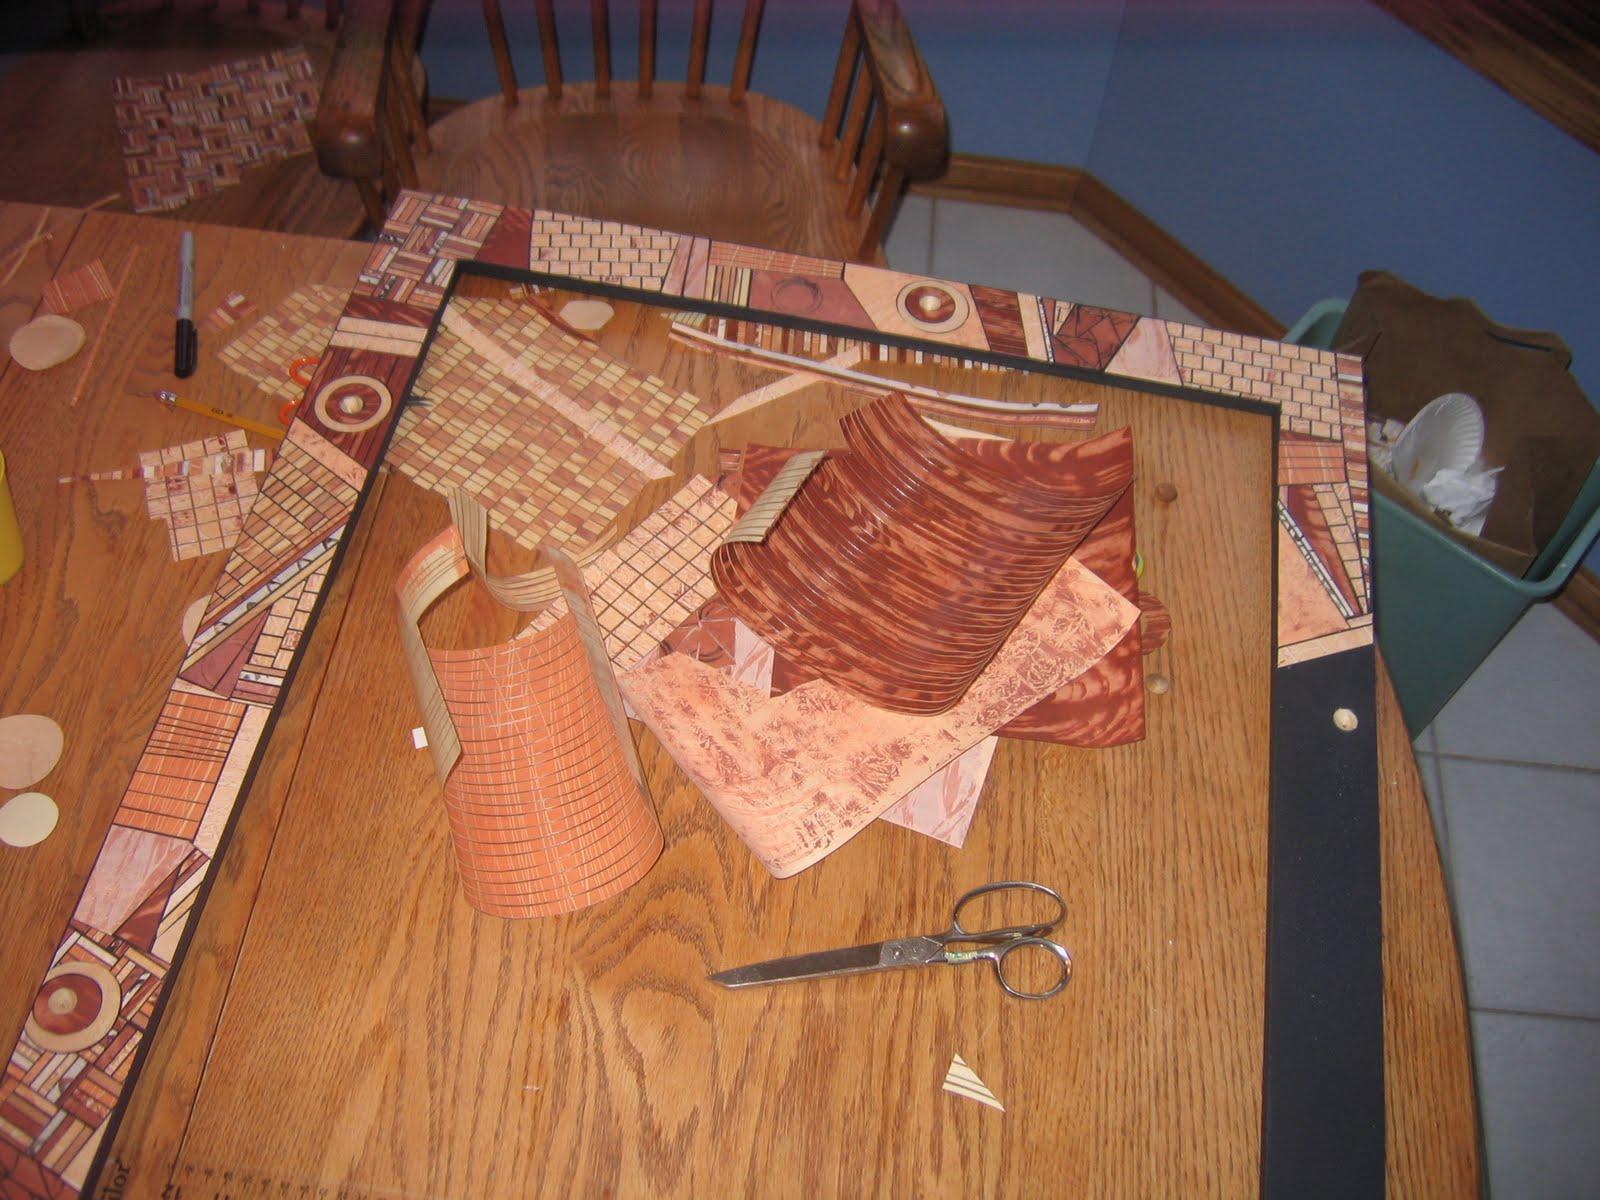 Mod Podge Kitchen Table Lorrie Grainger Abdo Paper Mosaic Mirror Frame Haworth Family